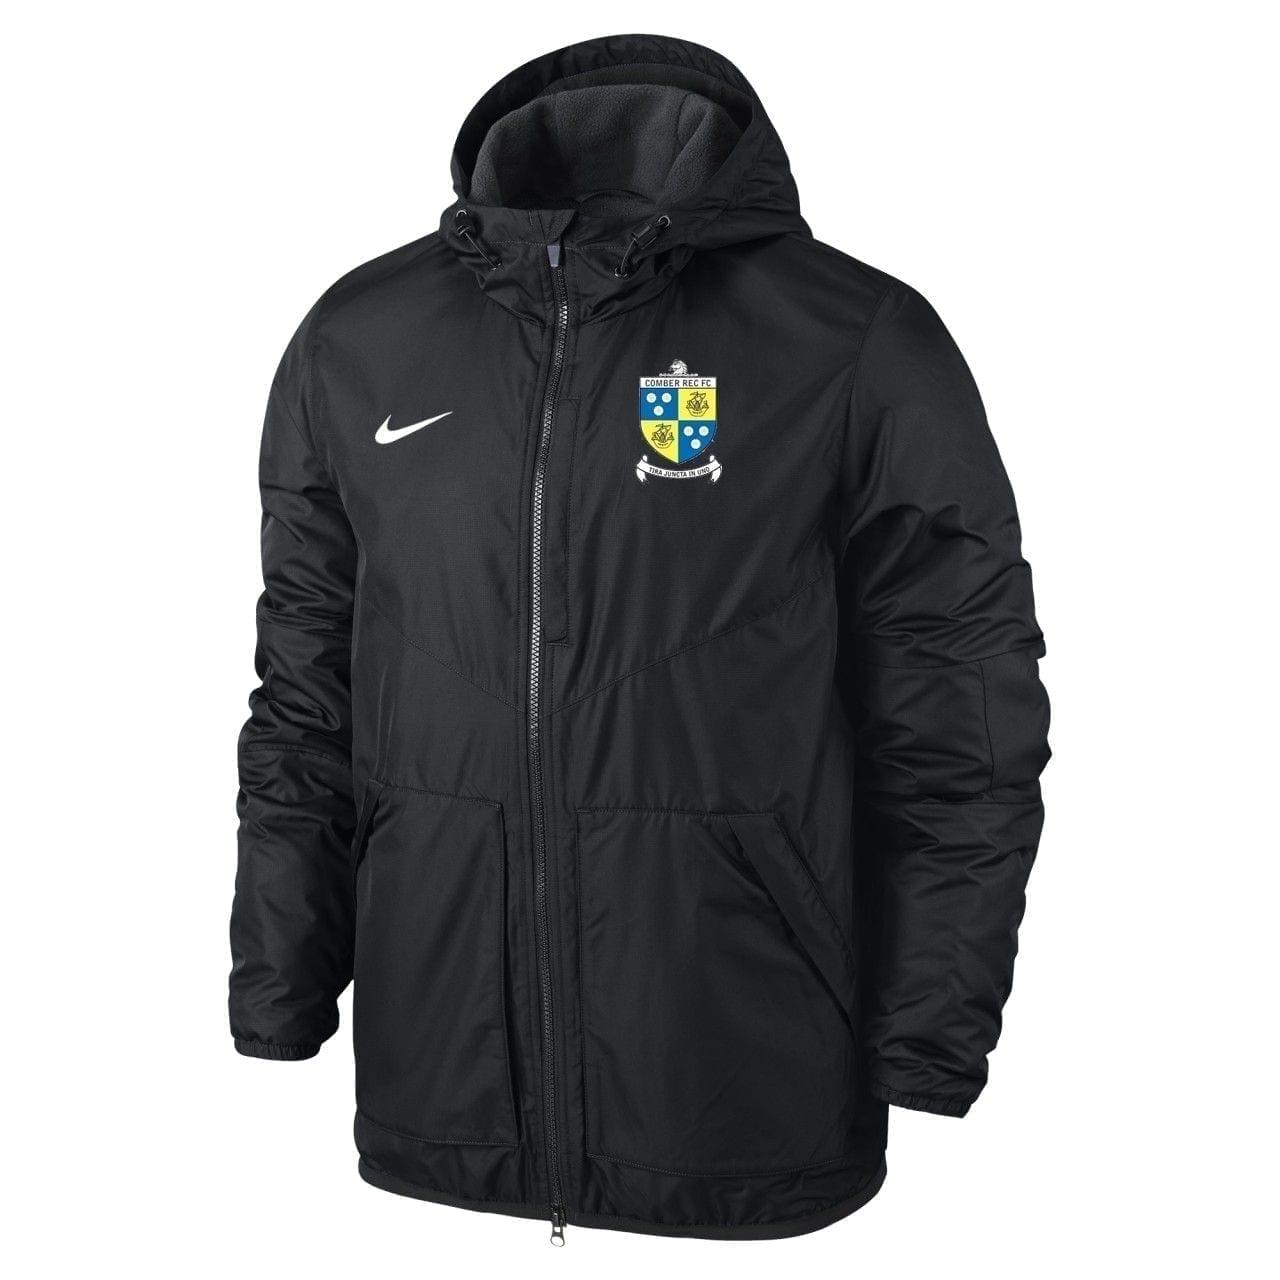 comber rec fall jacket ladies coaches size xxl adult 31149 p